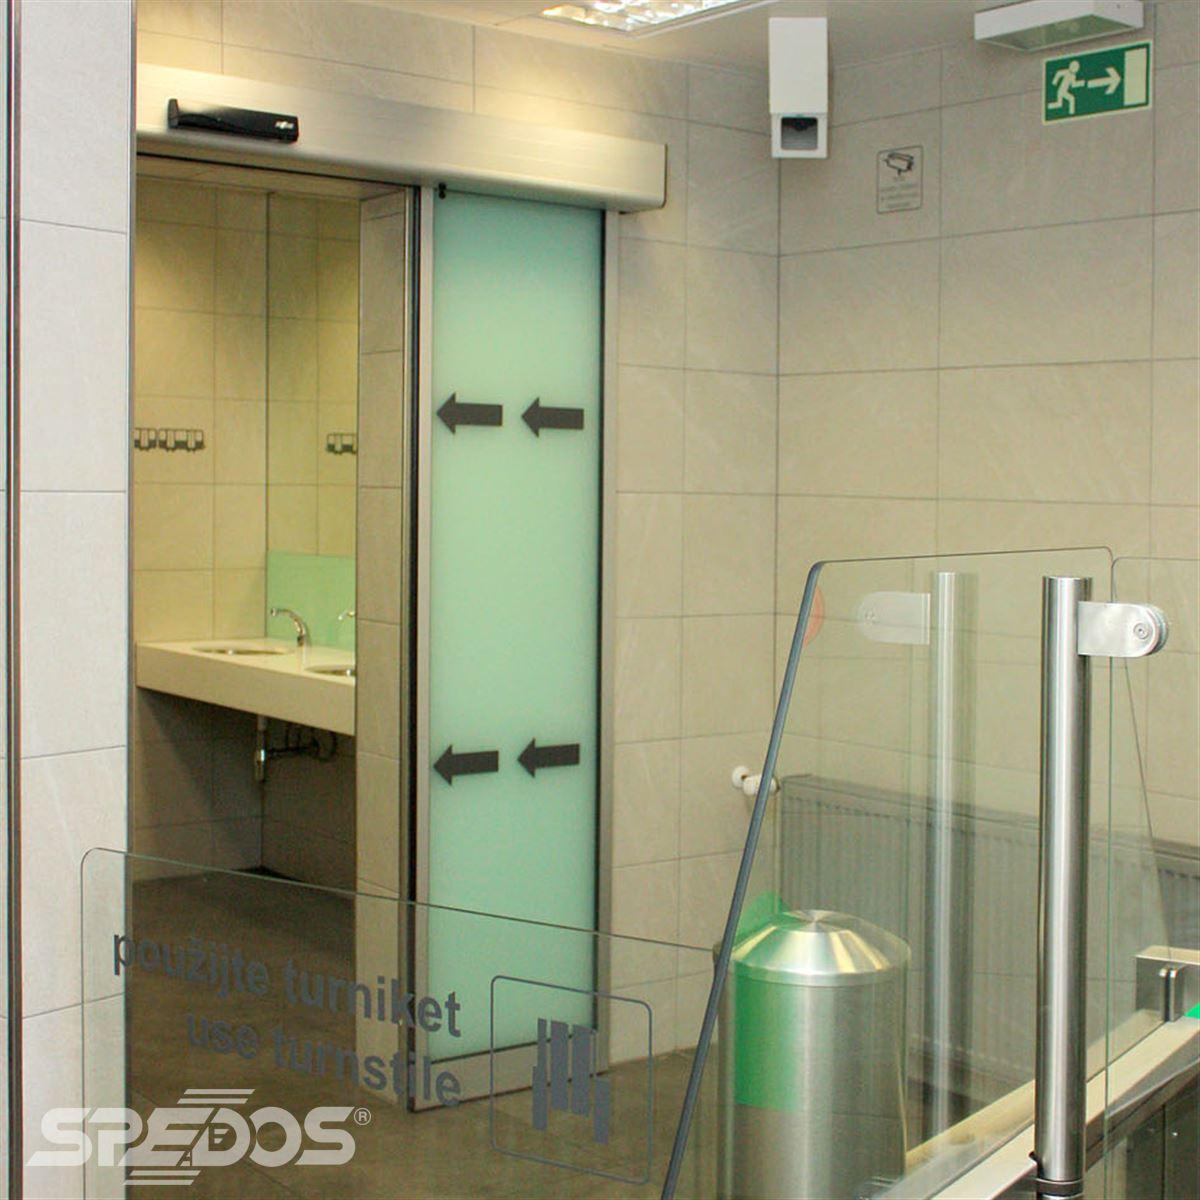 automatické posuvné dveře Spedos 2